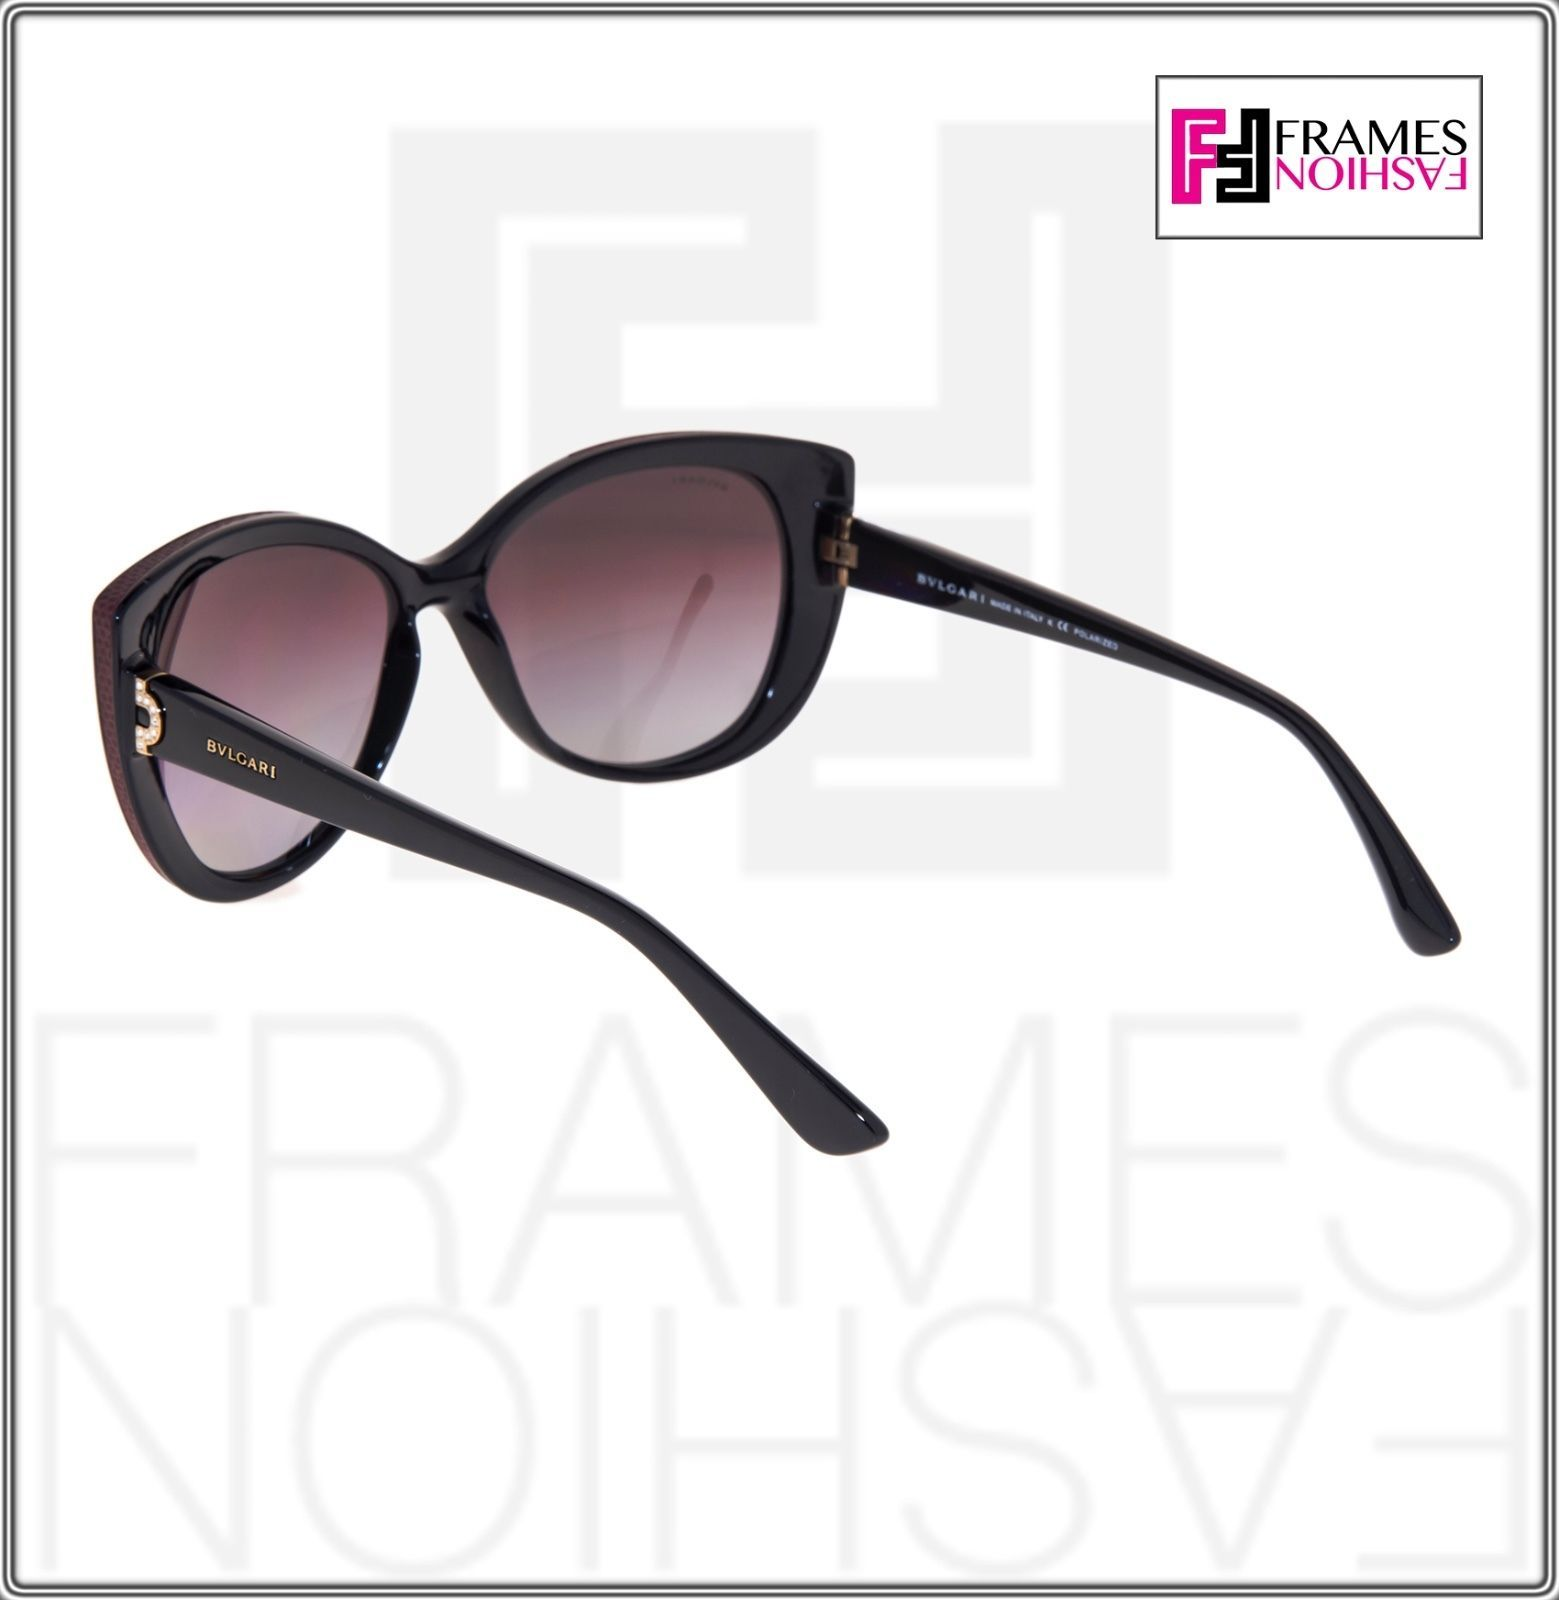 BVLGARI LOGO BV8157BQ Black Burgundy Leather Violet POLARIZED Sunglasses 8157 image 3